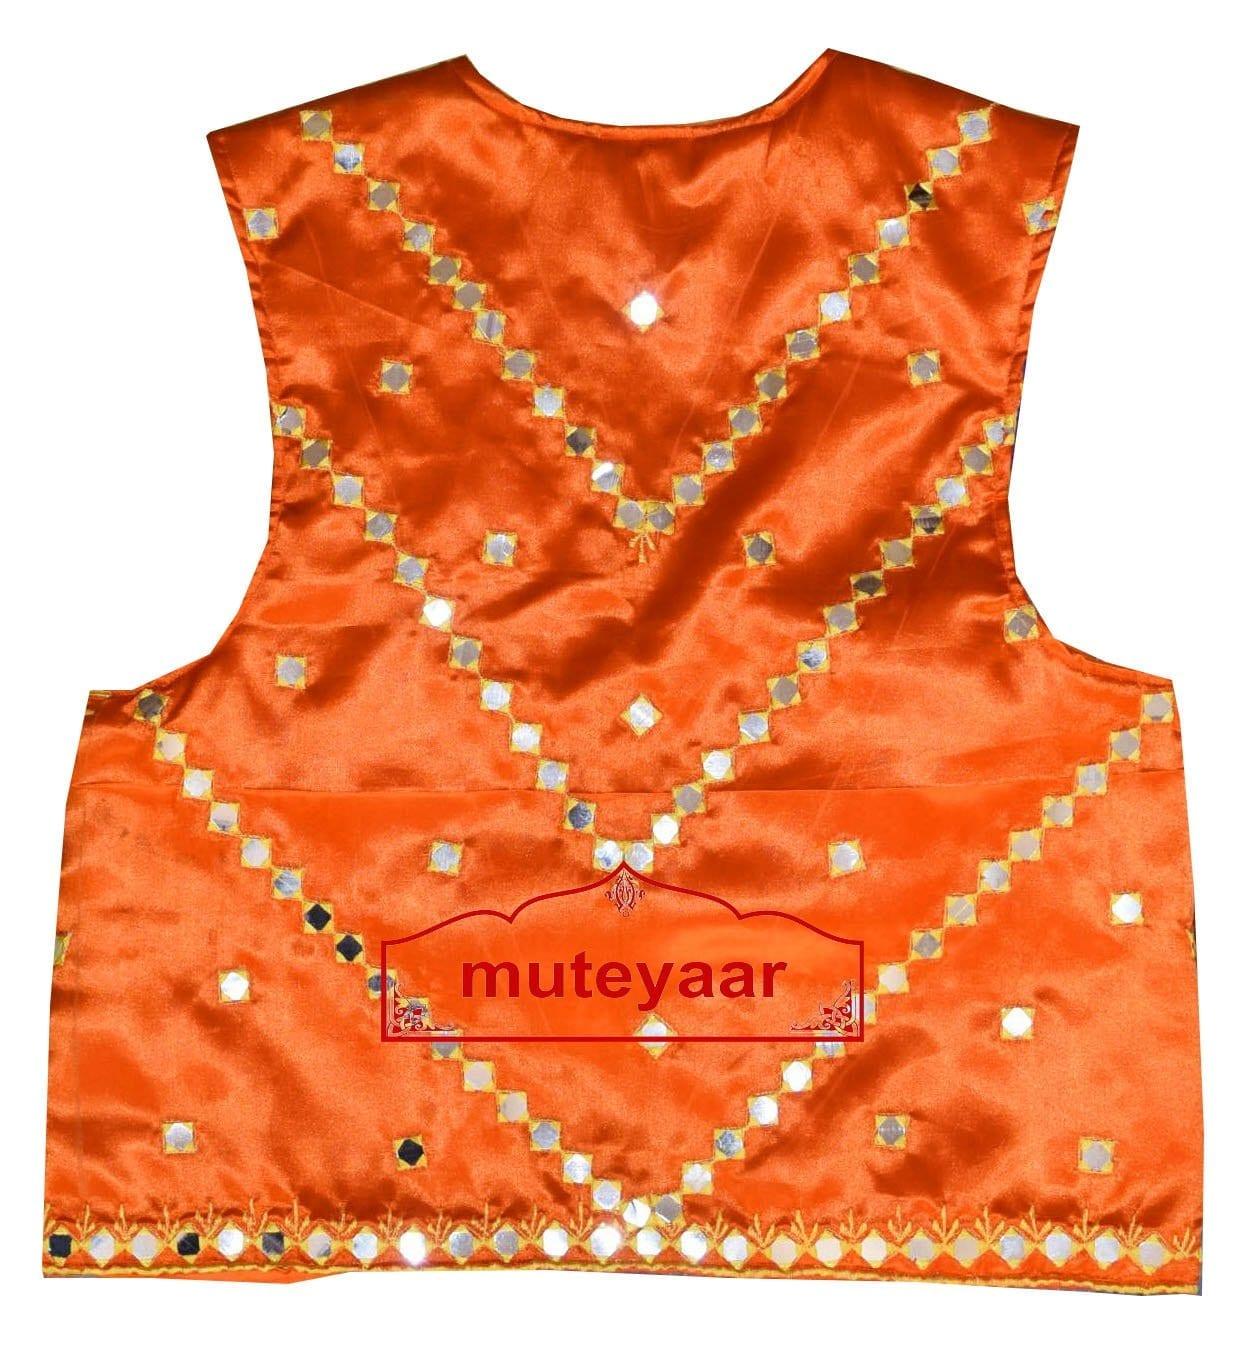 Diagonal Mirrors Work Bhangra Dance Dress Outfit Costume Attire 3